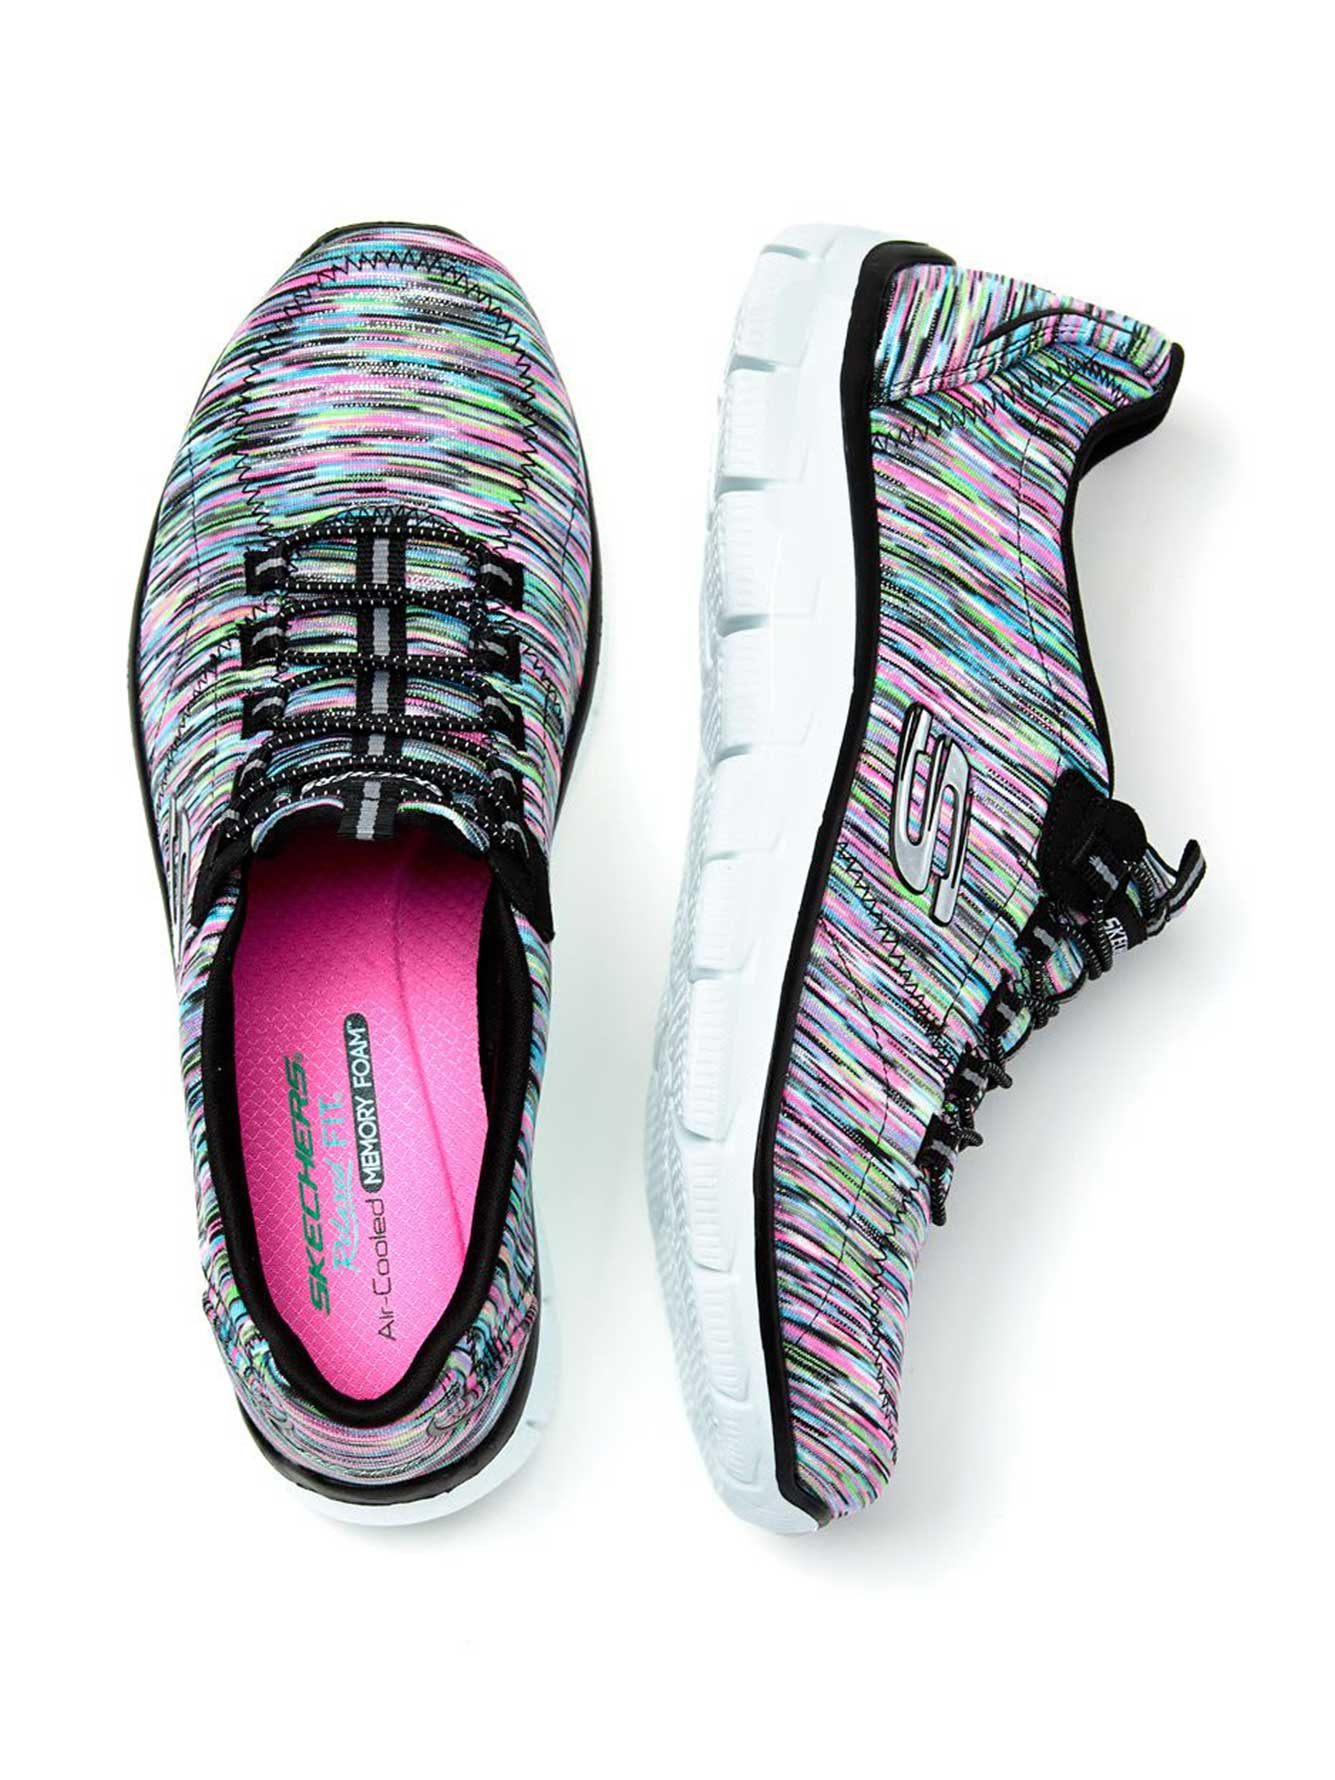 skechers chaussures de sport pieds larges penningtons. Black Bedroom Furniture Sets. Home Design Ideas